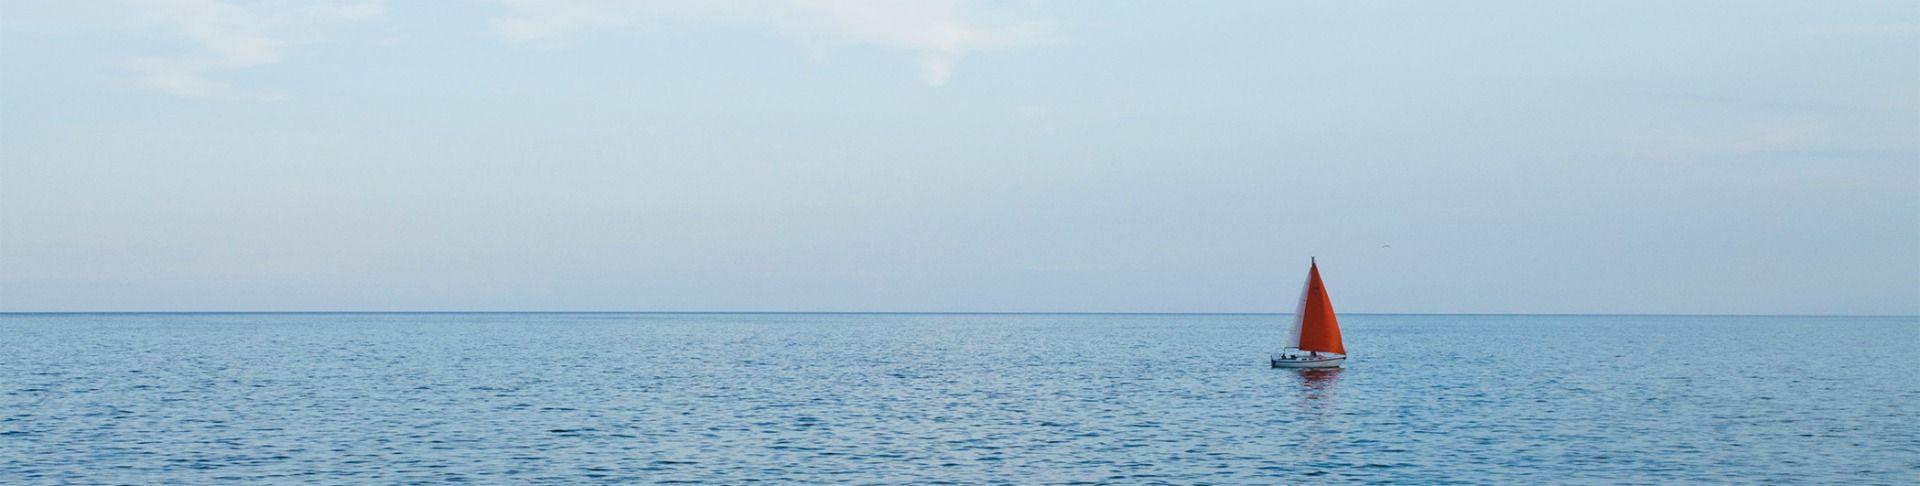 /online-boatdriver-sportbootfuehrerschein-binnen-motor-segel-d